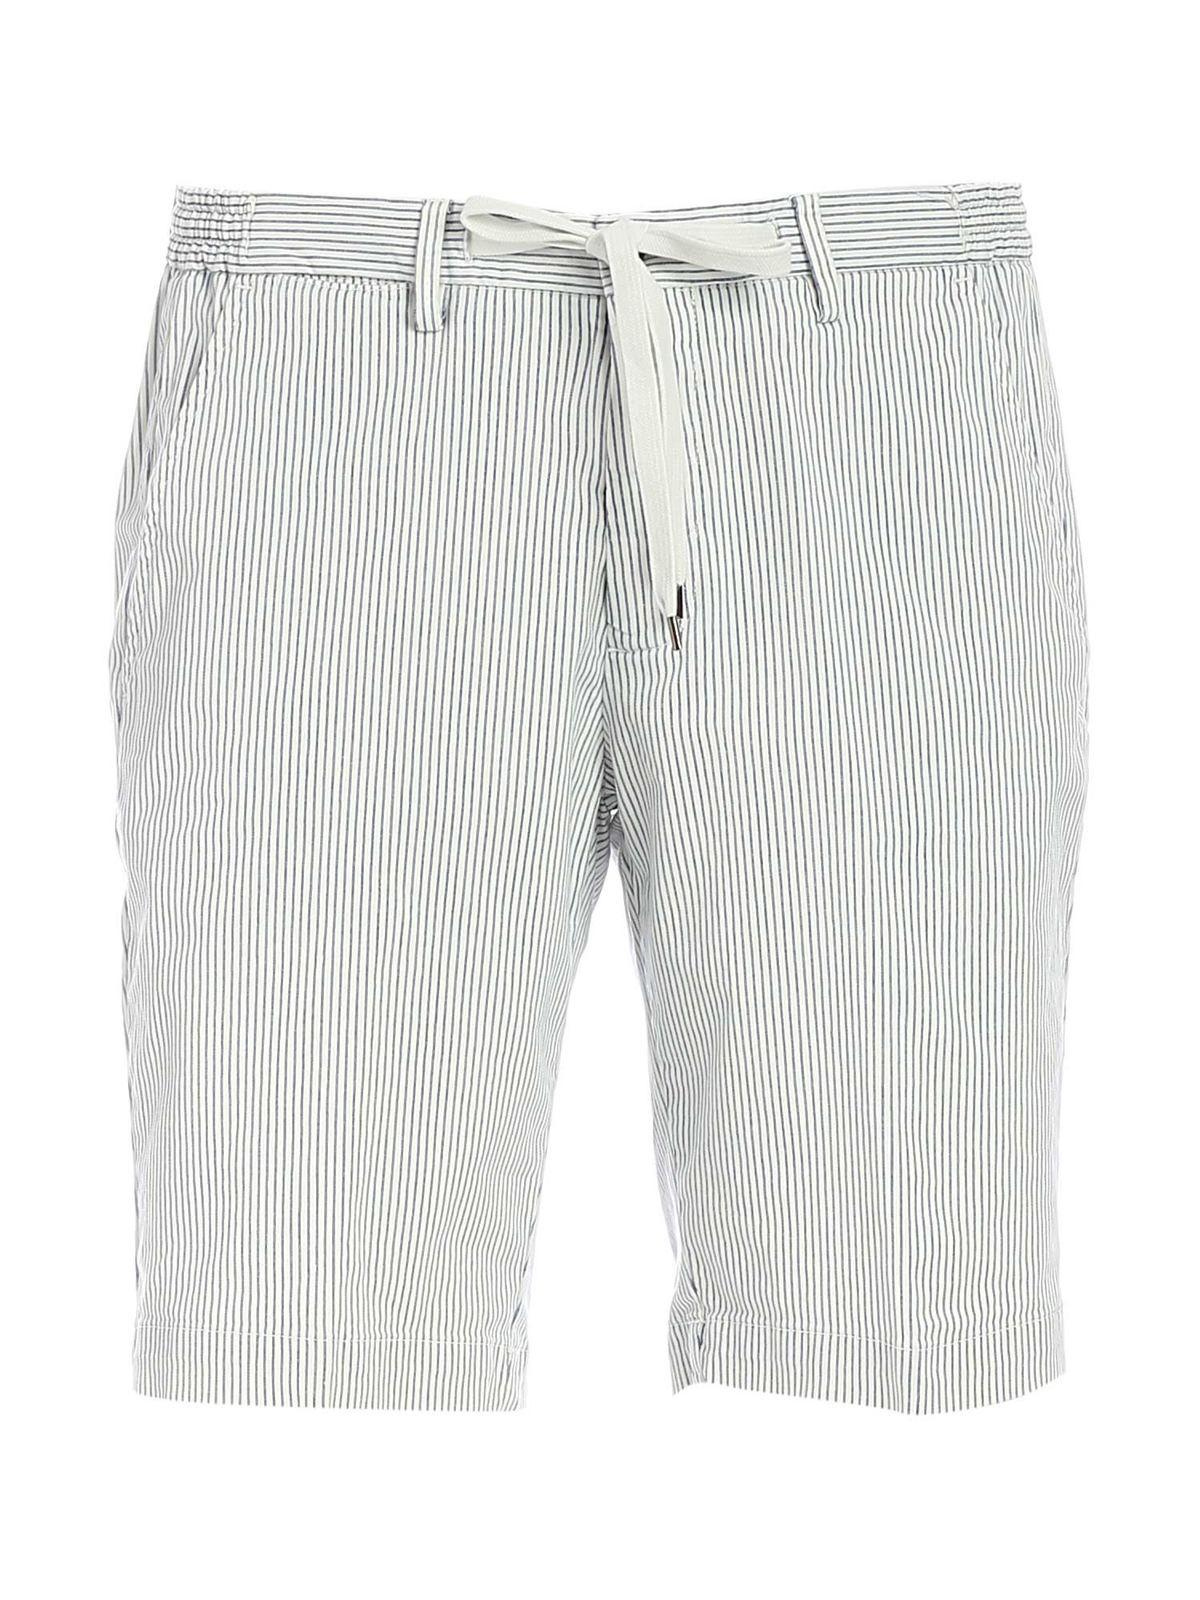 Briglia 1949 Shorts STRIPED BERMUDA IN WHITE AND BLUE